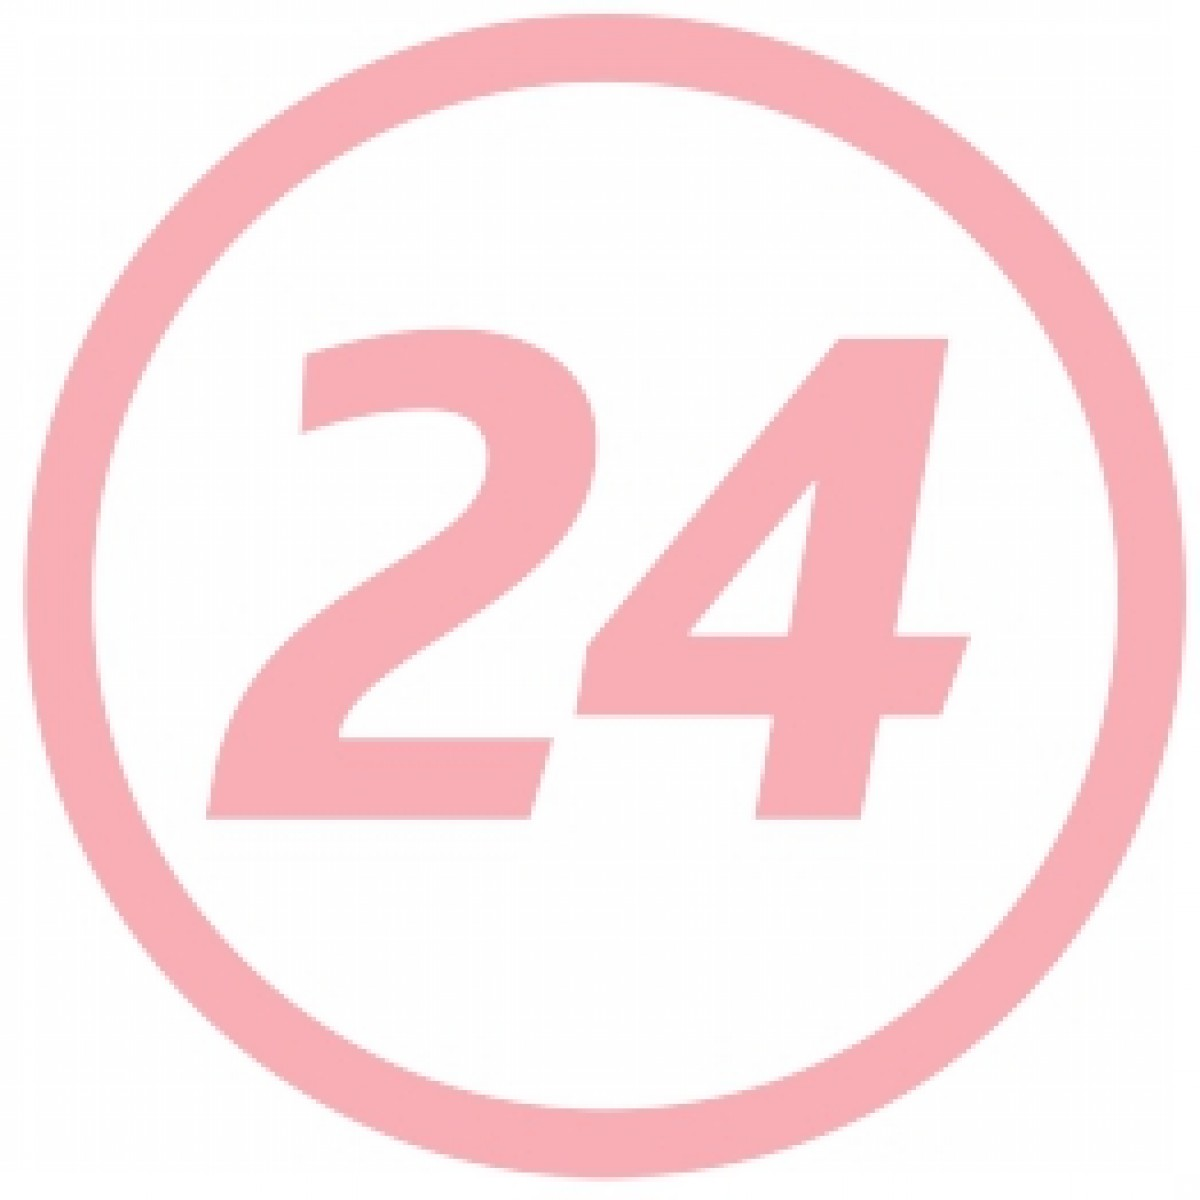 Ducray A-Derma Protect AC Fluid Matifiant SPF 50+, Fluid, 40ml